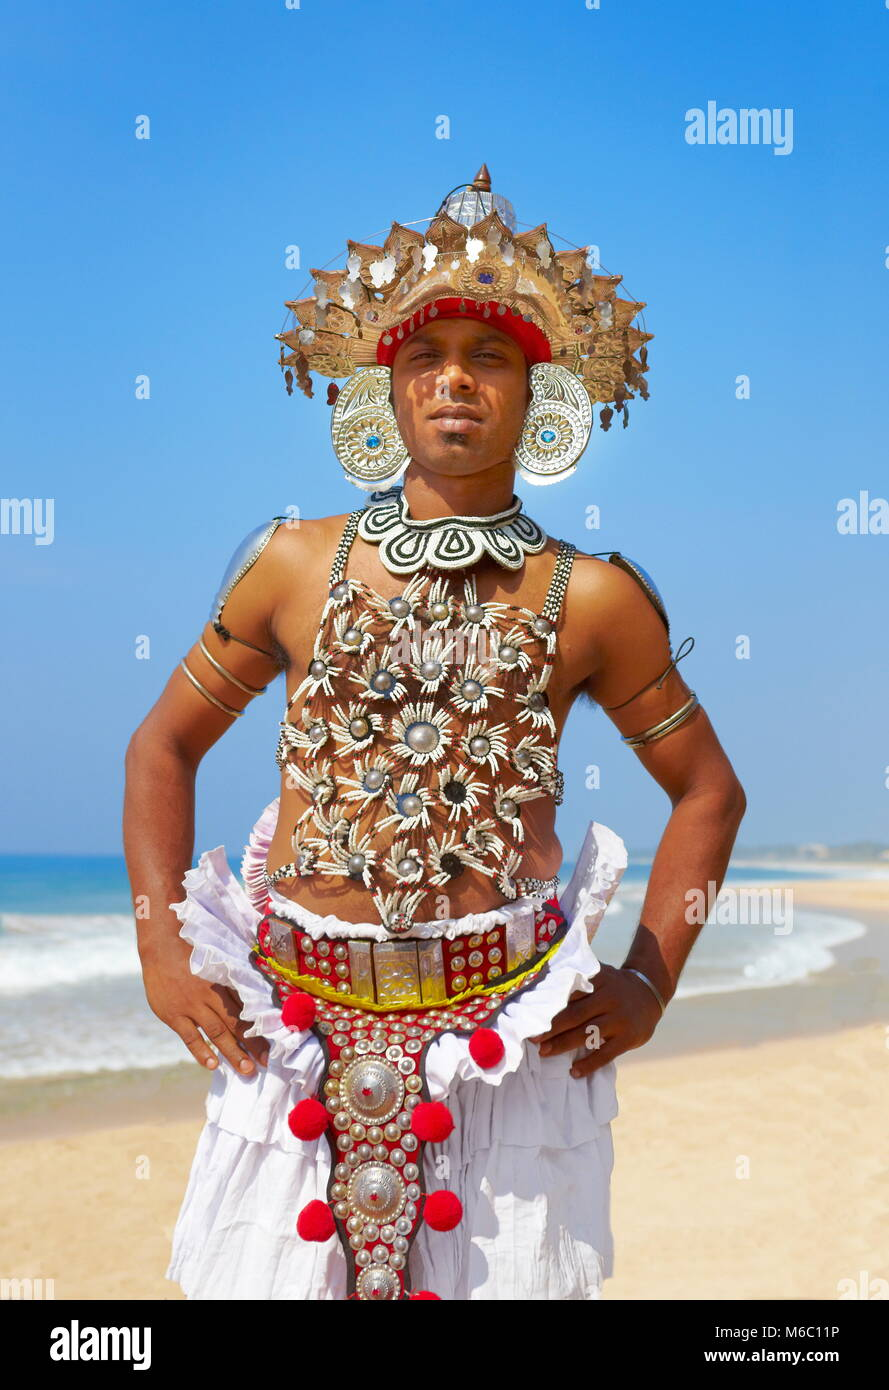 Bailarín local vestida con traje tradicional, Sri Lanka Imagen De Stock